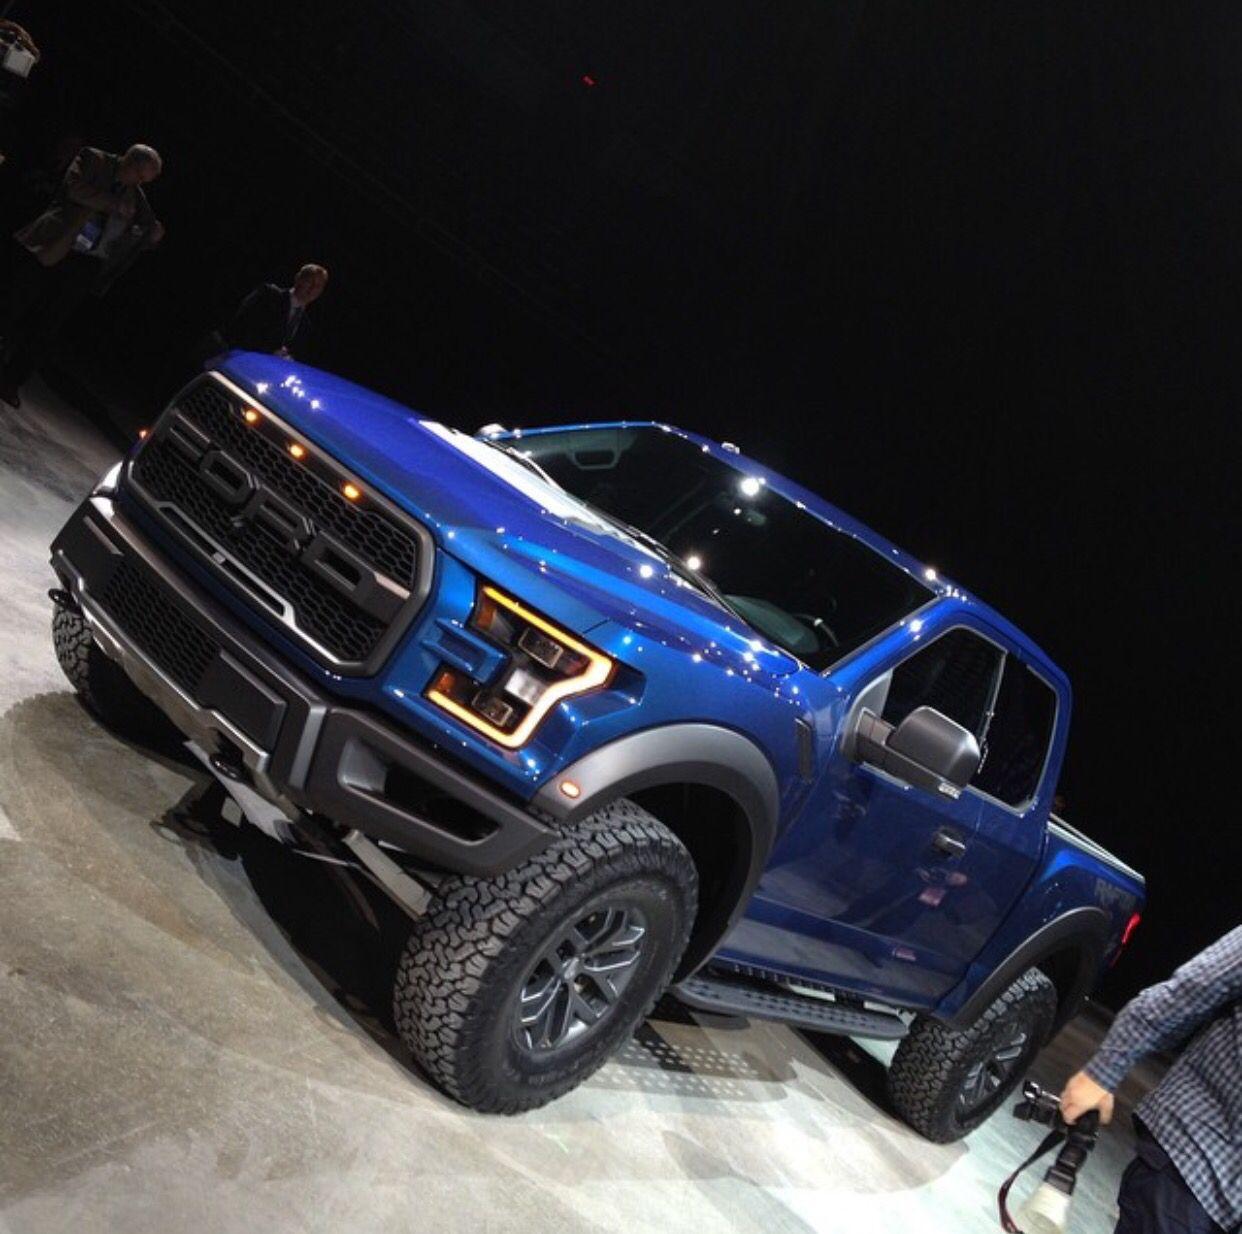 2017 Ford F150 Raptor Optional V6 Ecoboost with 10 speed